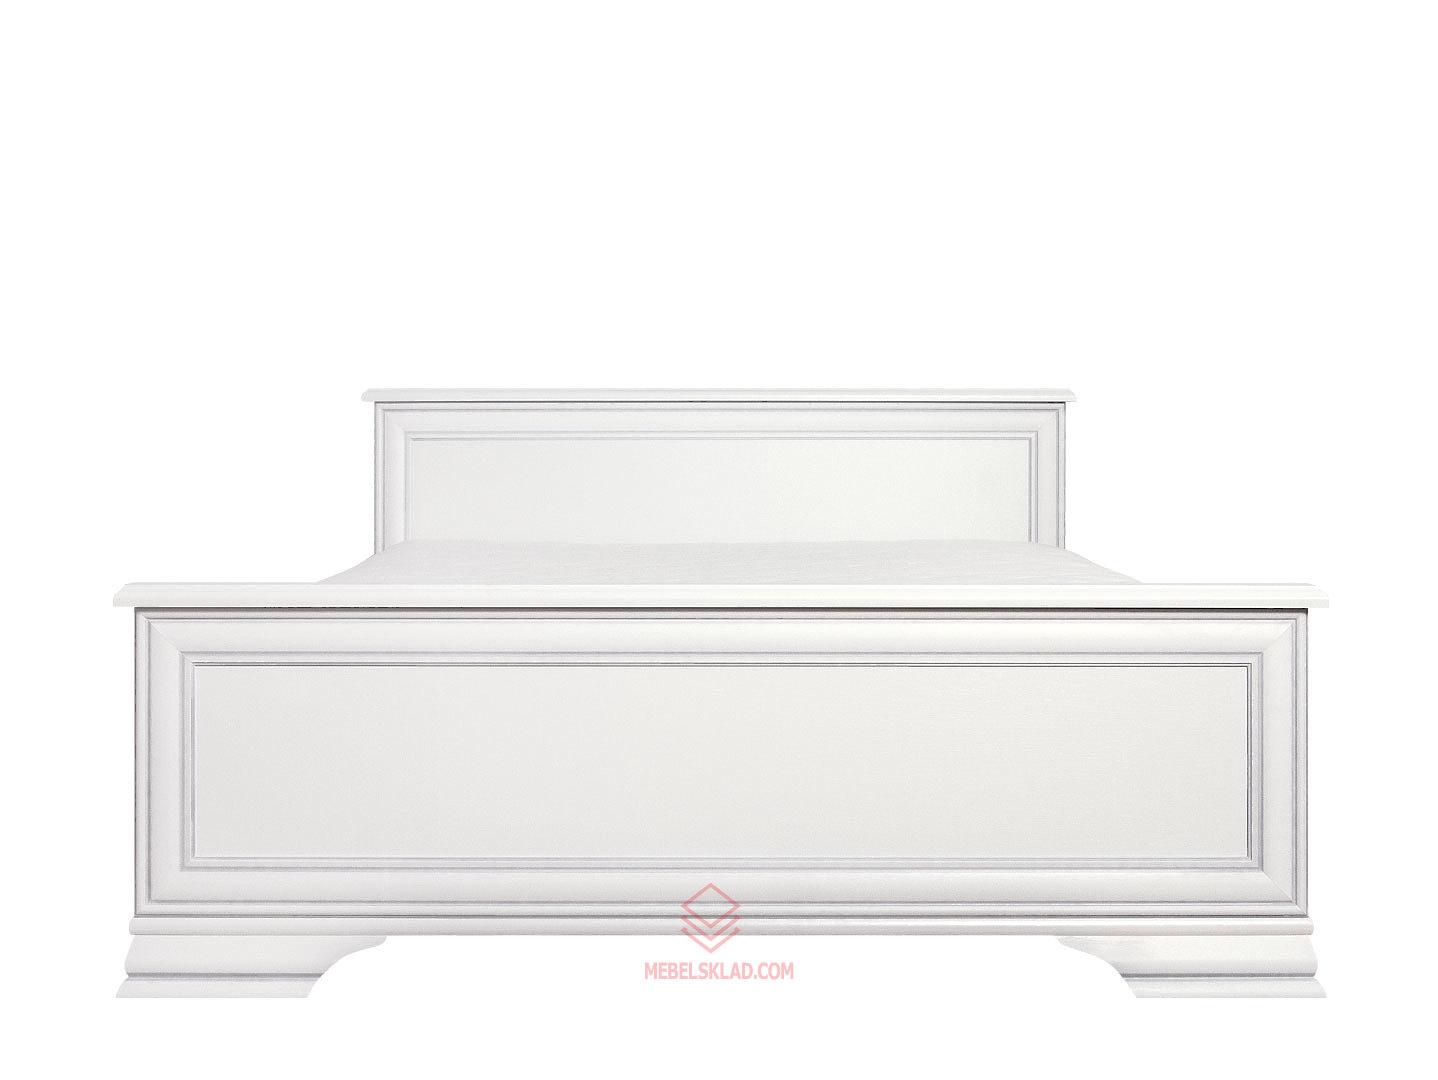 Кровать новая LOZ140x200 белый KENTAKI за 18706 ₽